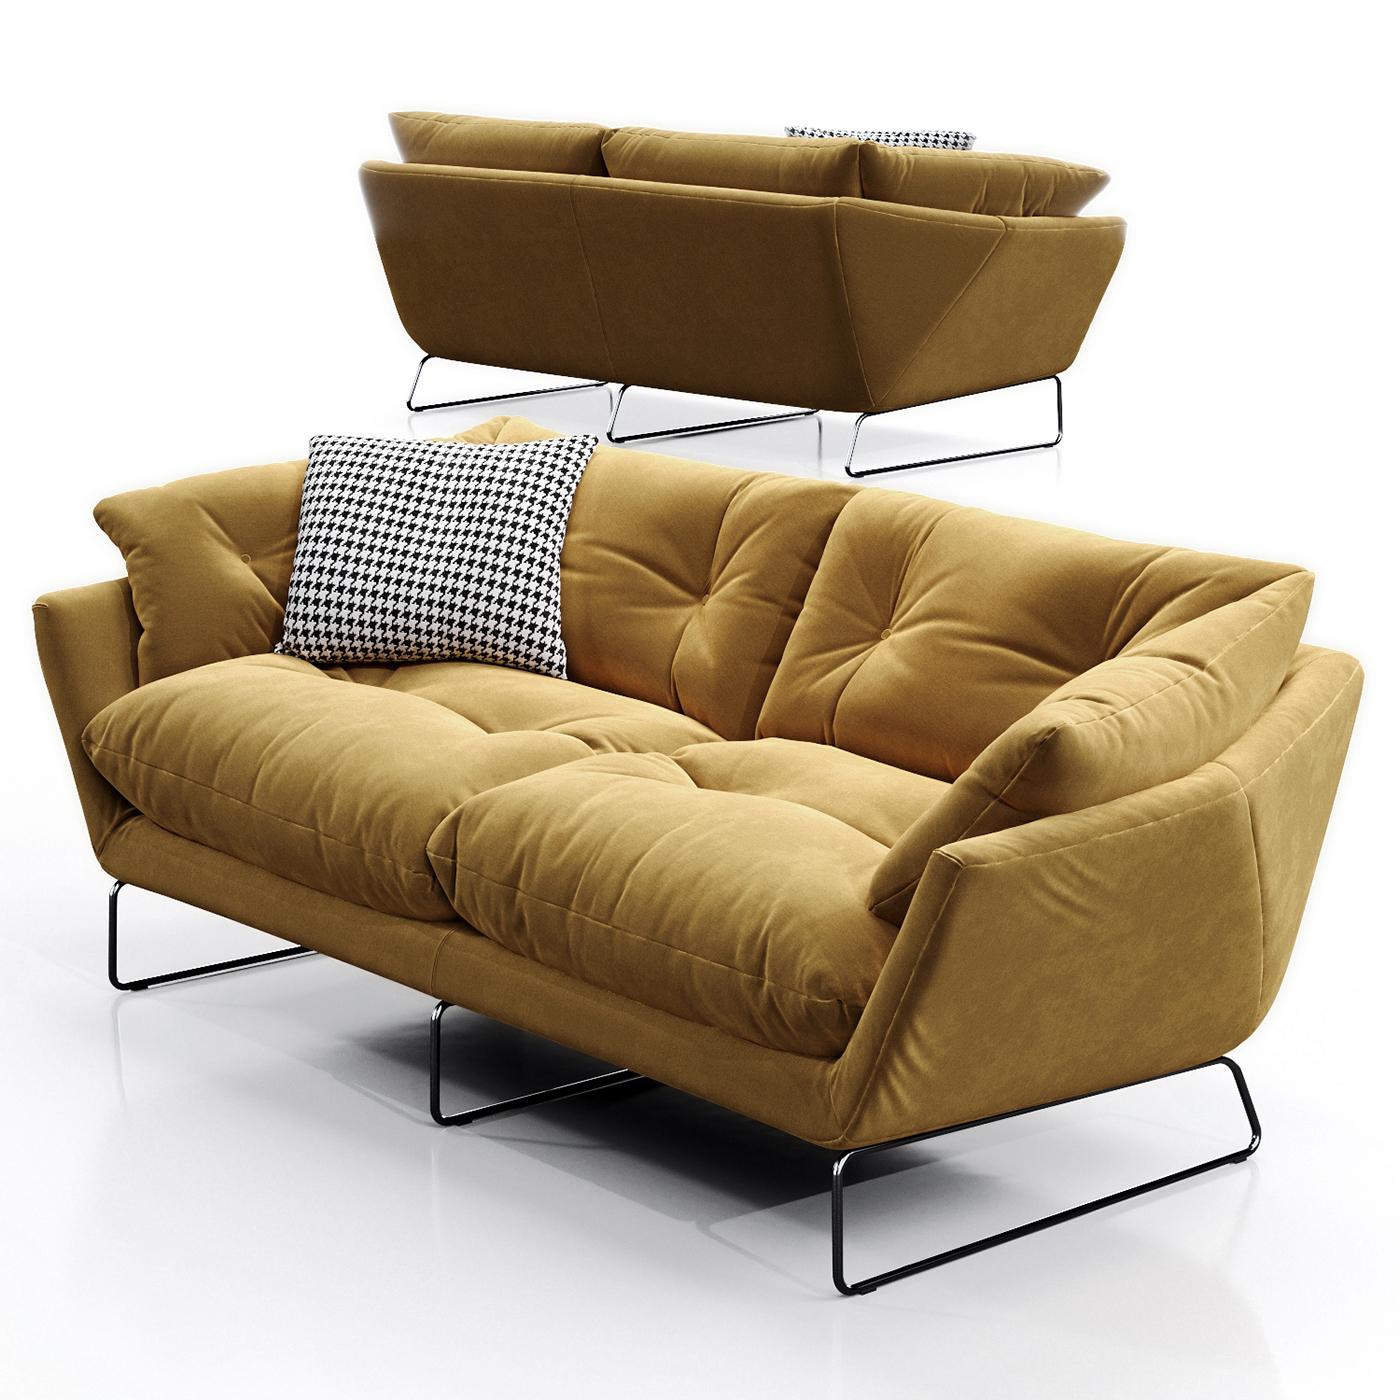 3d model saba italia new york suite sofa on behance for Sofa new york